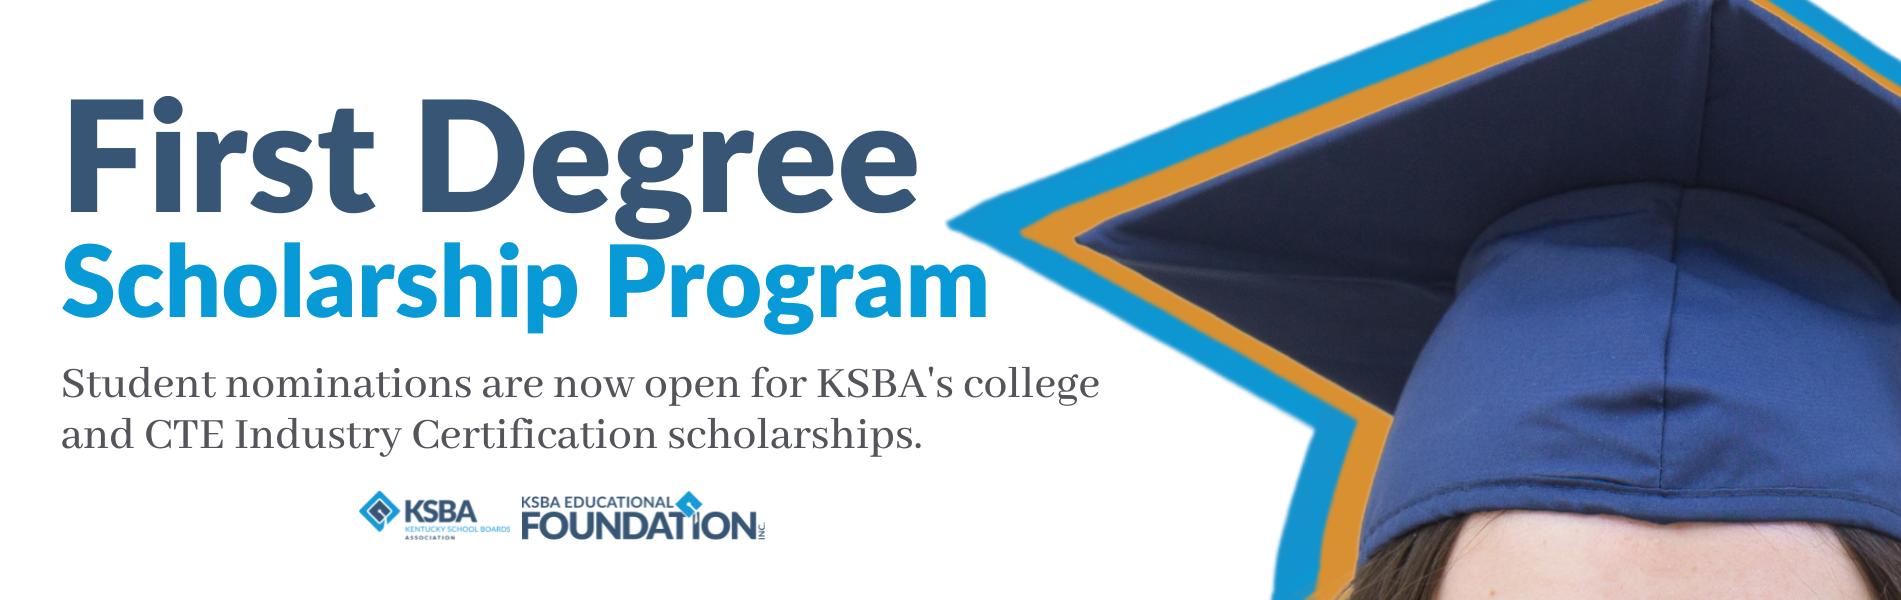 first degree scholarship program